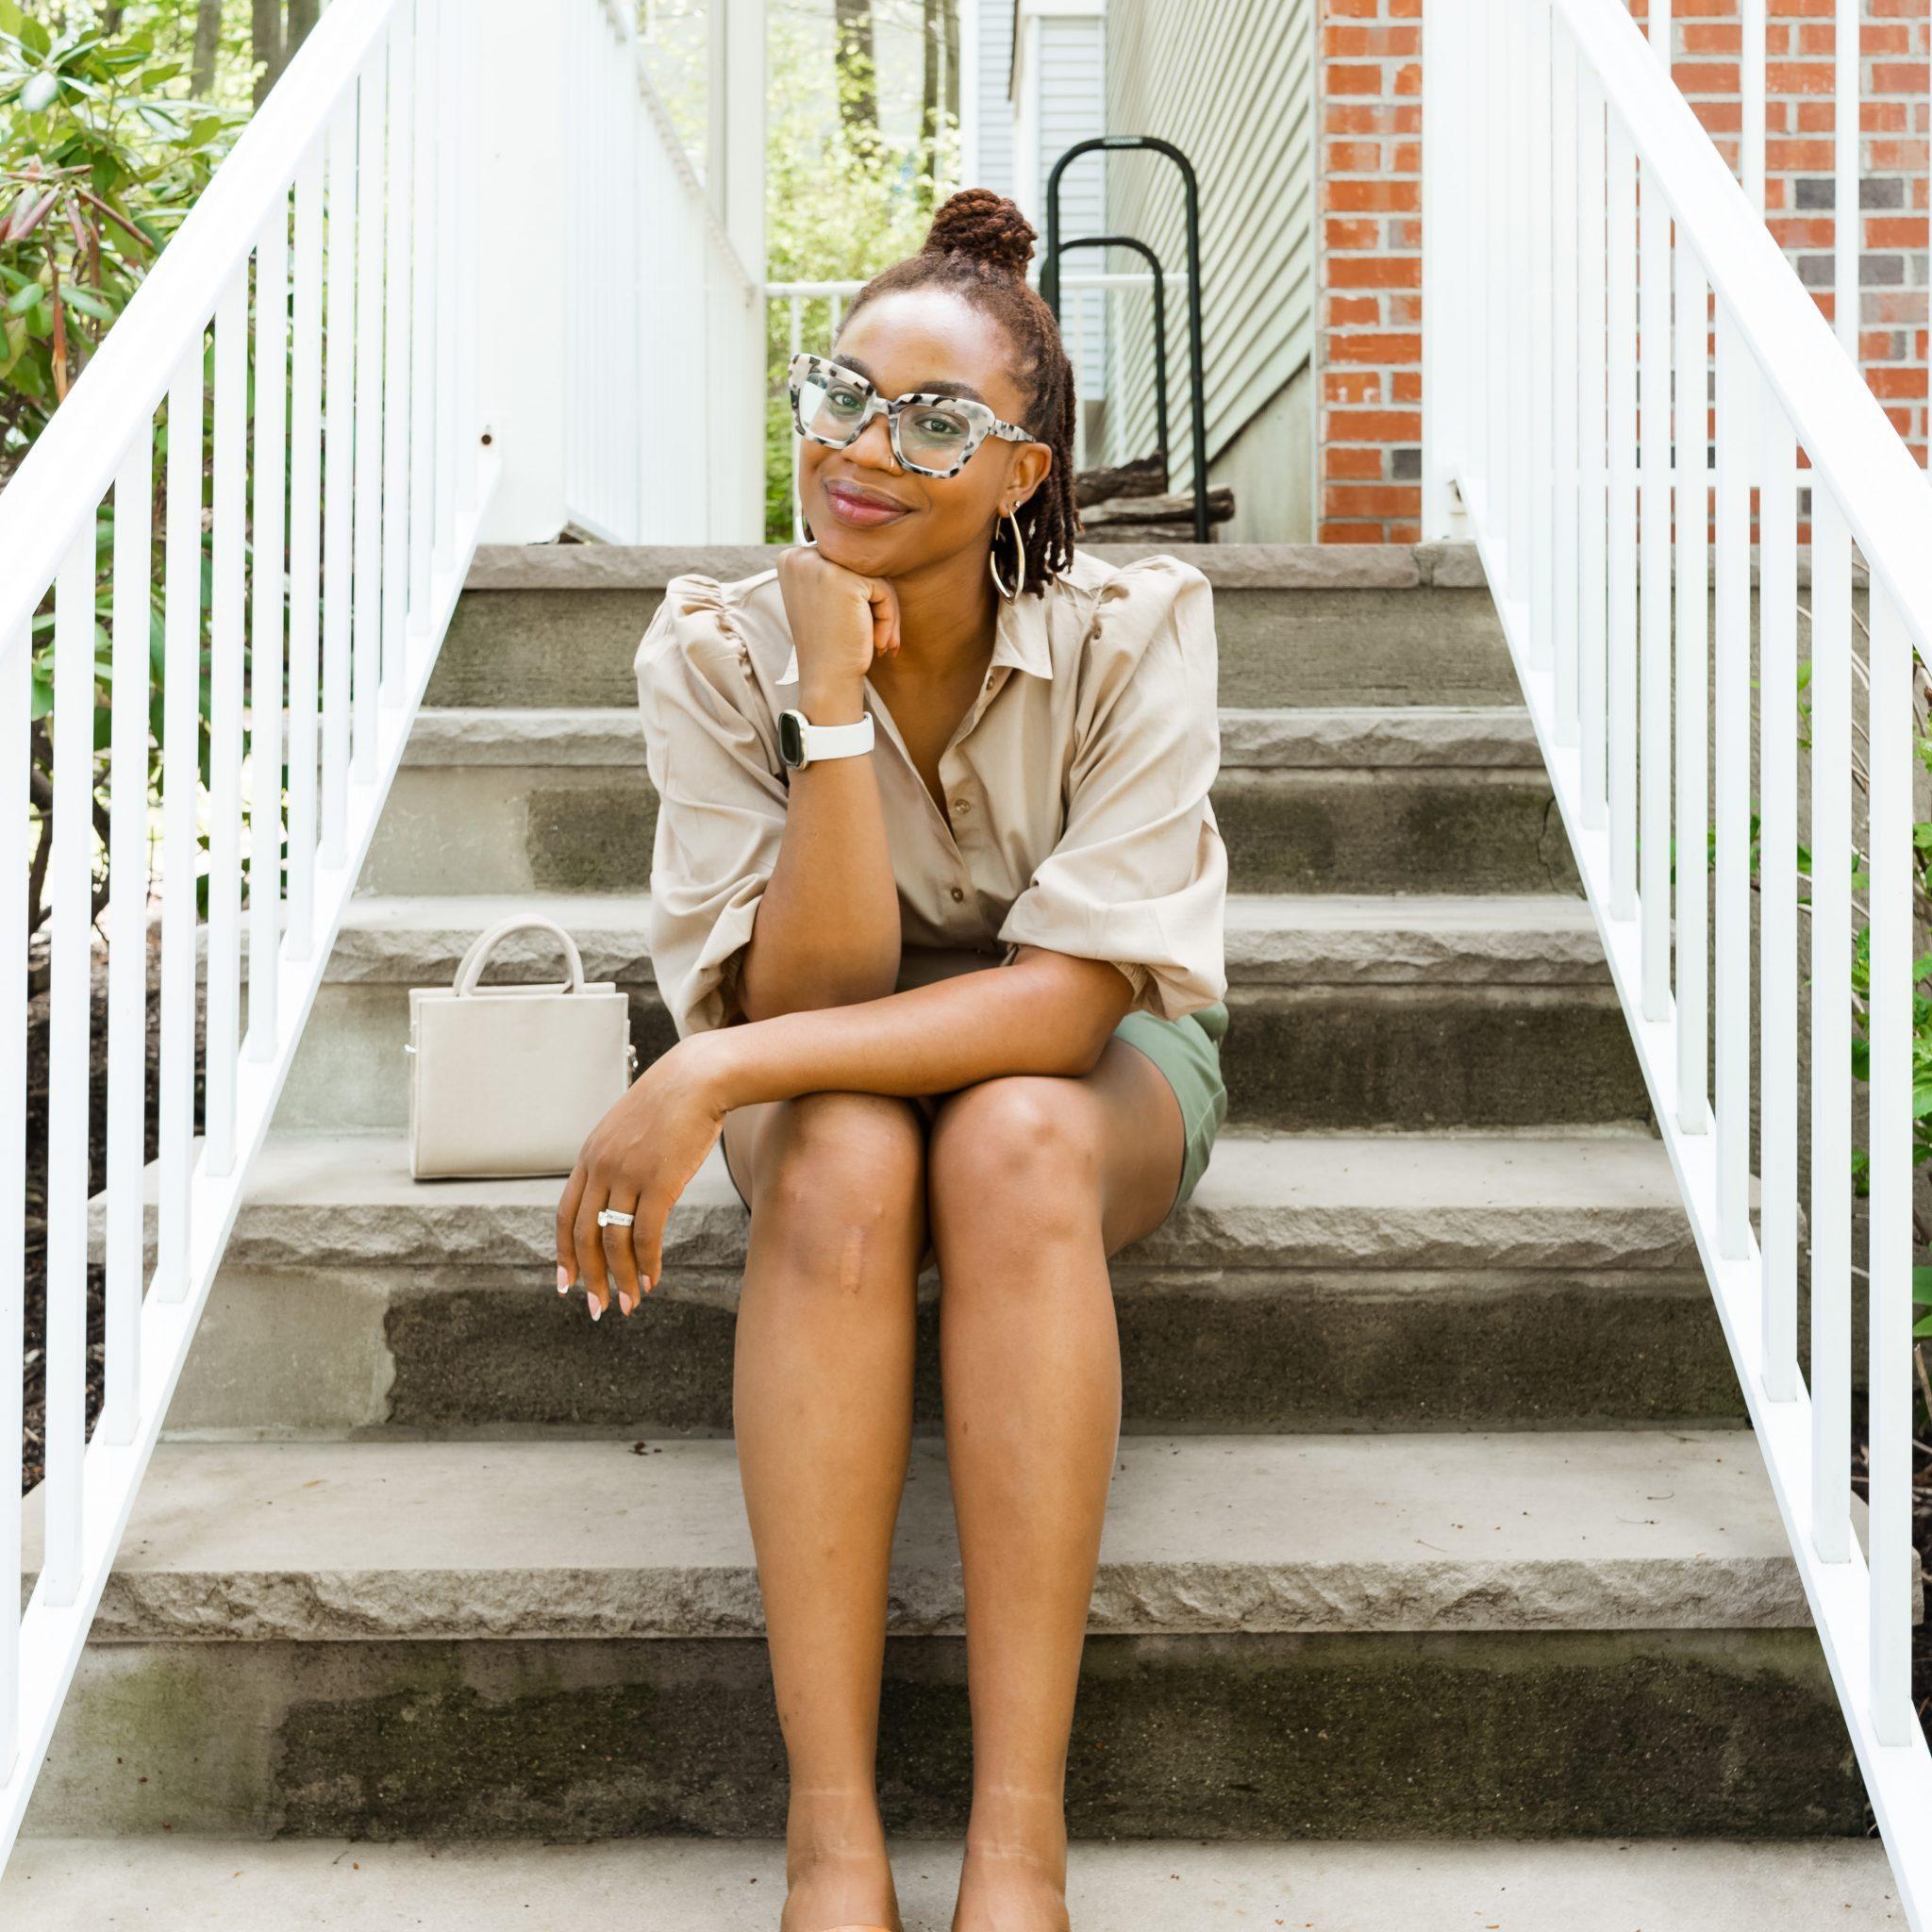 Ijeoma Kola How to Grow on Instagram in 2021 (The Hard Truth)